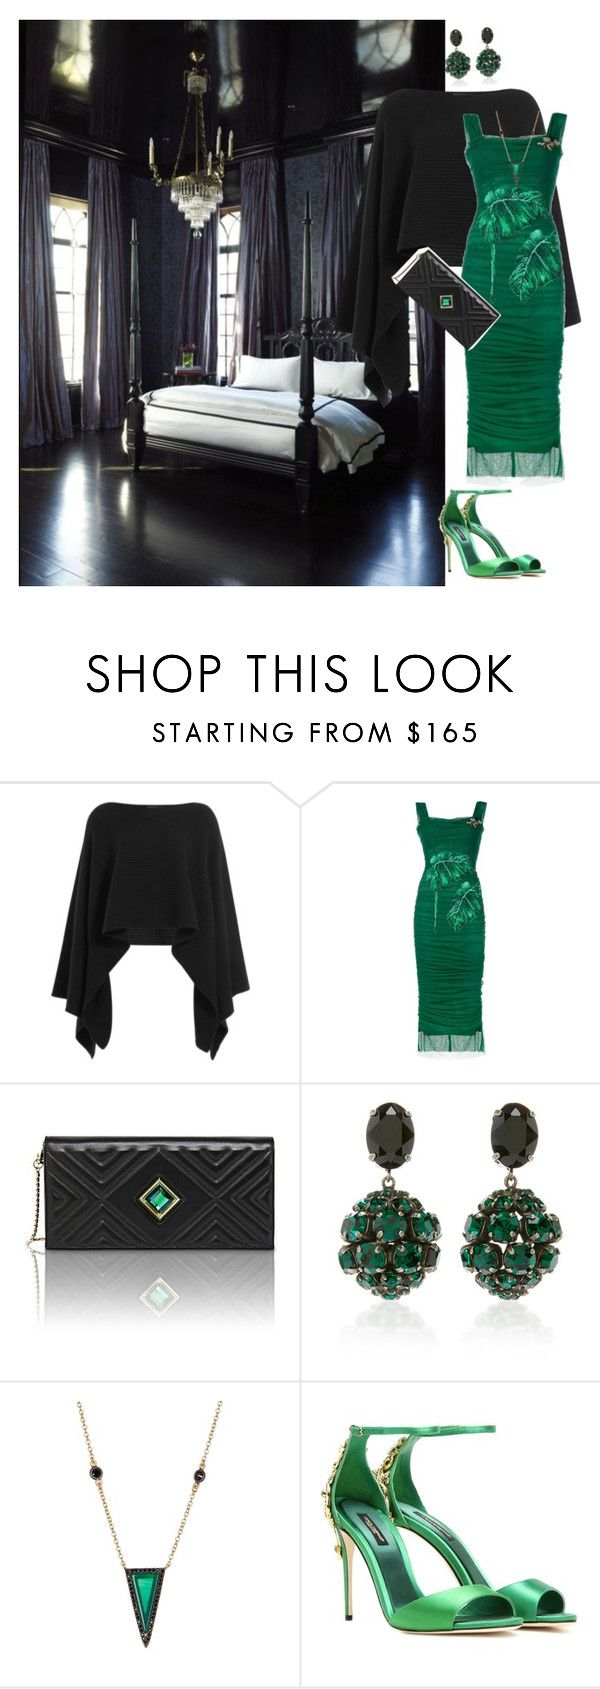 """French Quarter Glamorous!!"" by denibrad ❤ liked on Polyvore featuring Donna Karan, Dolce&Gabbana, Kristina George, Marni and Freida Rothman"